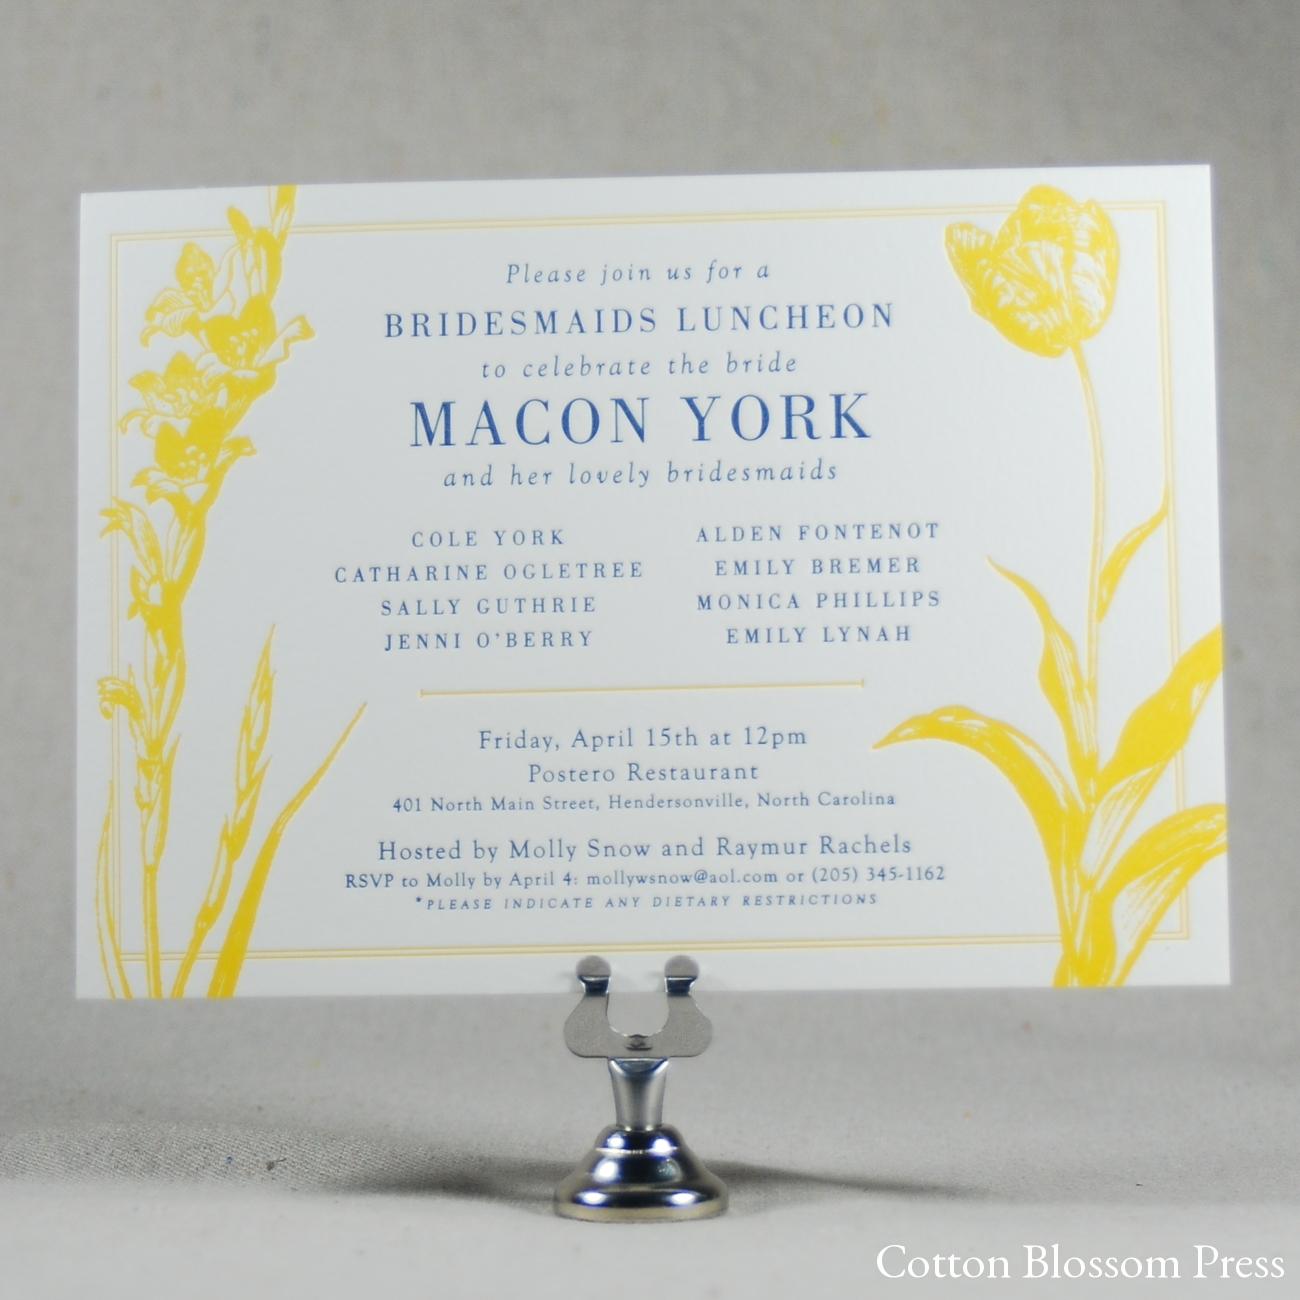 CBP-Wedding_Macon_BridesmaidLuncheon.JPG